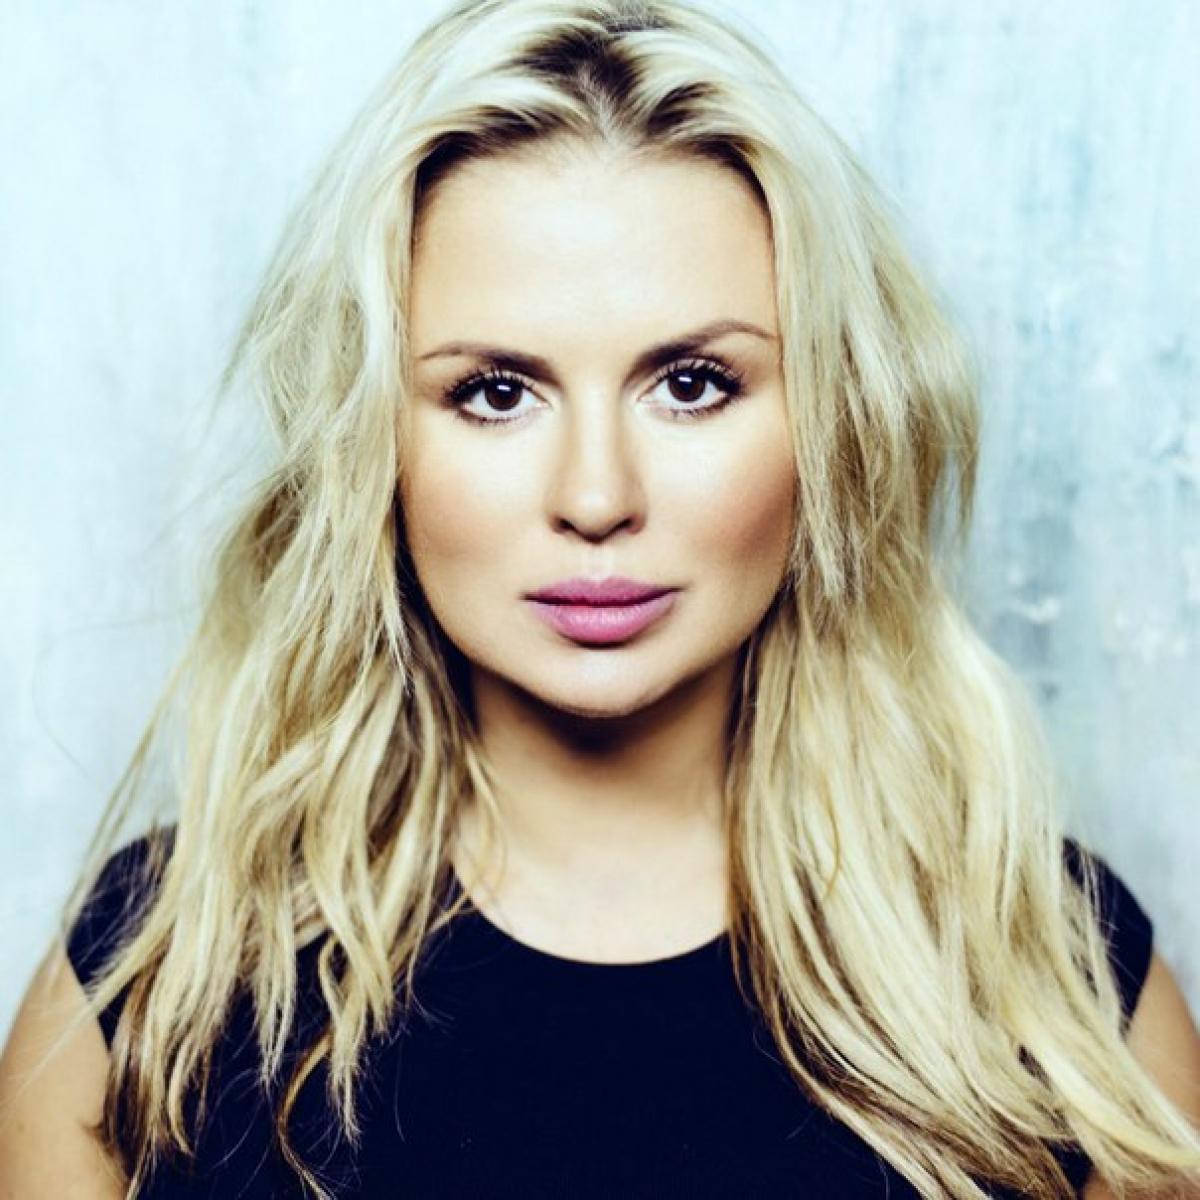 Анна Семенович похудела на 2,5 кг